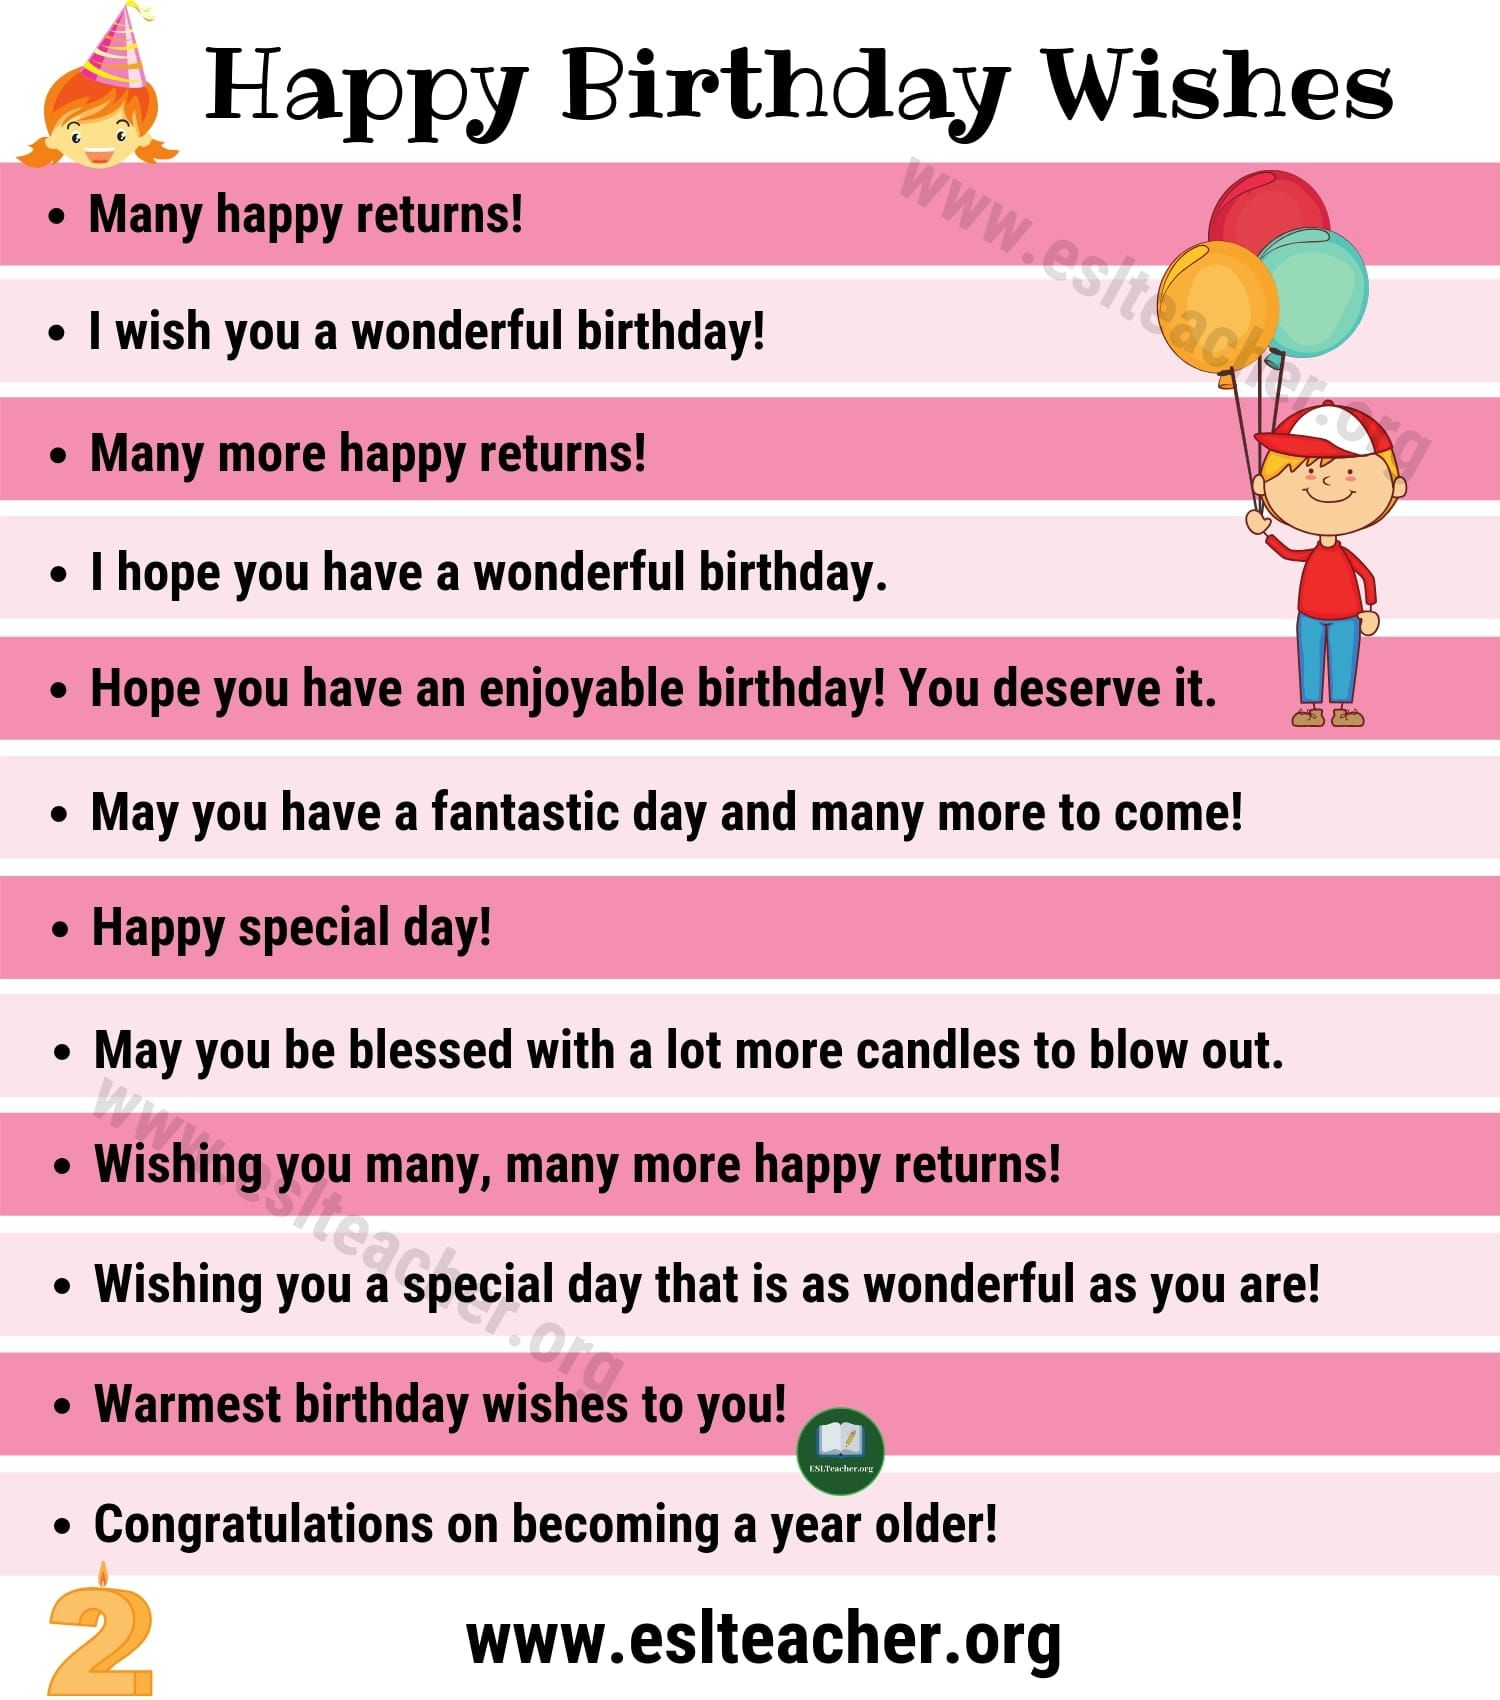 Birthday Wishes 35 Funny Ways to Say Happy Birthday in